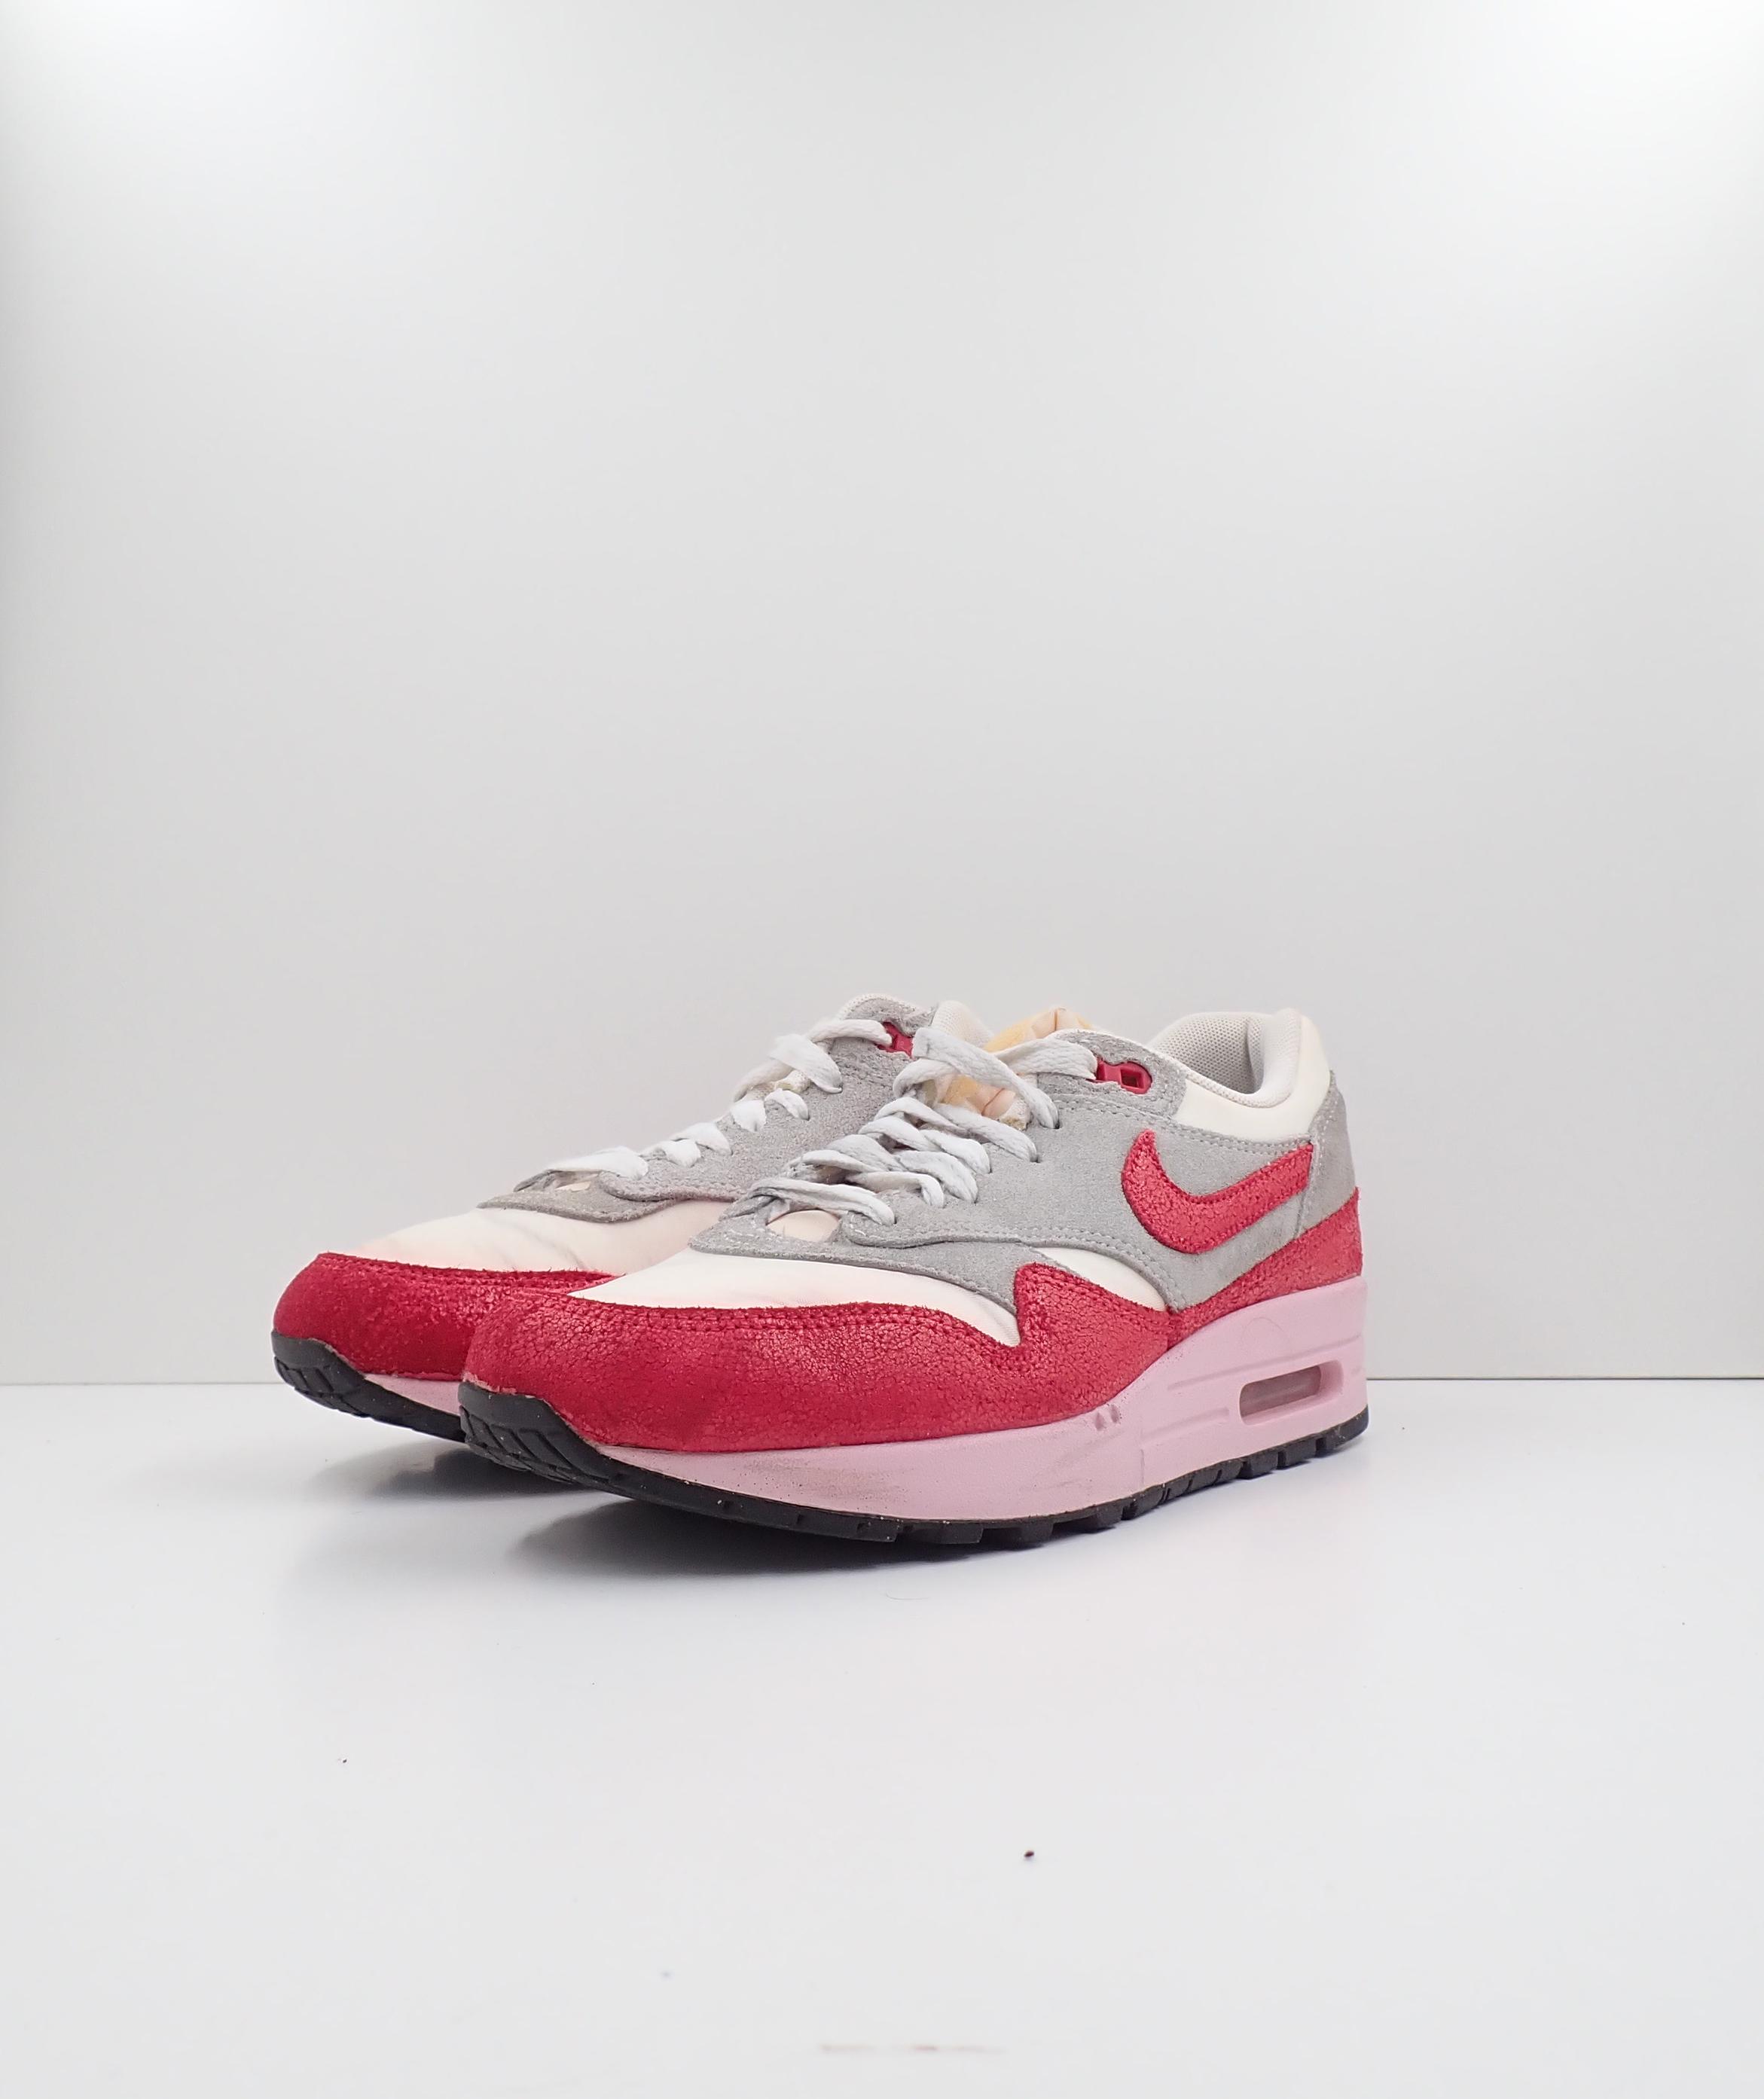 Nike Air Max 1 Vintage Hyper Red (W)